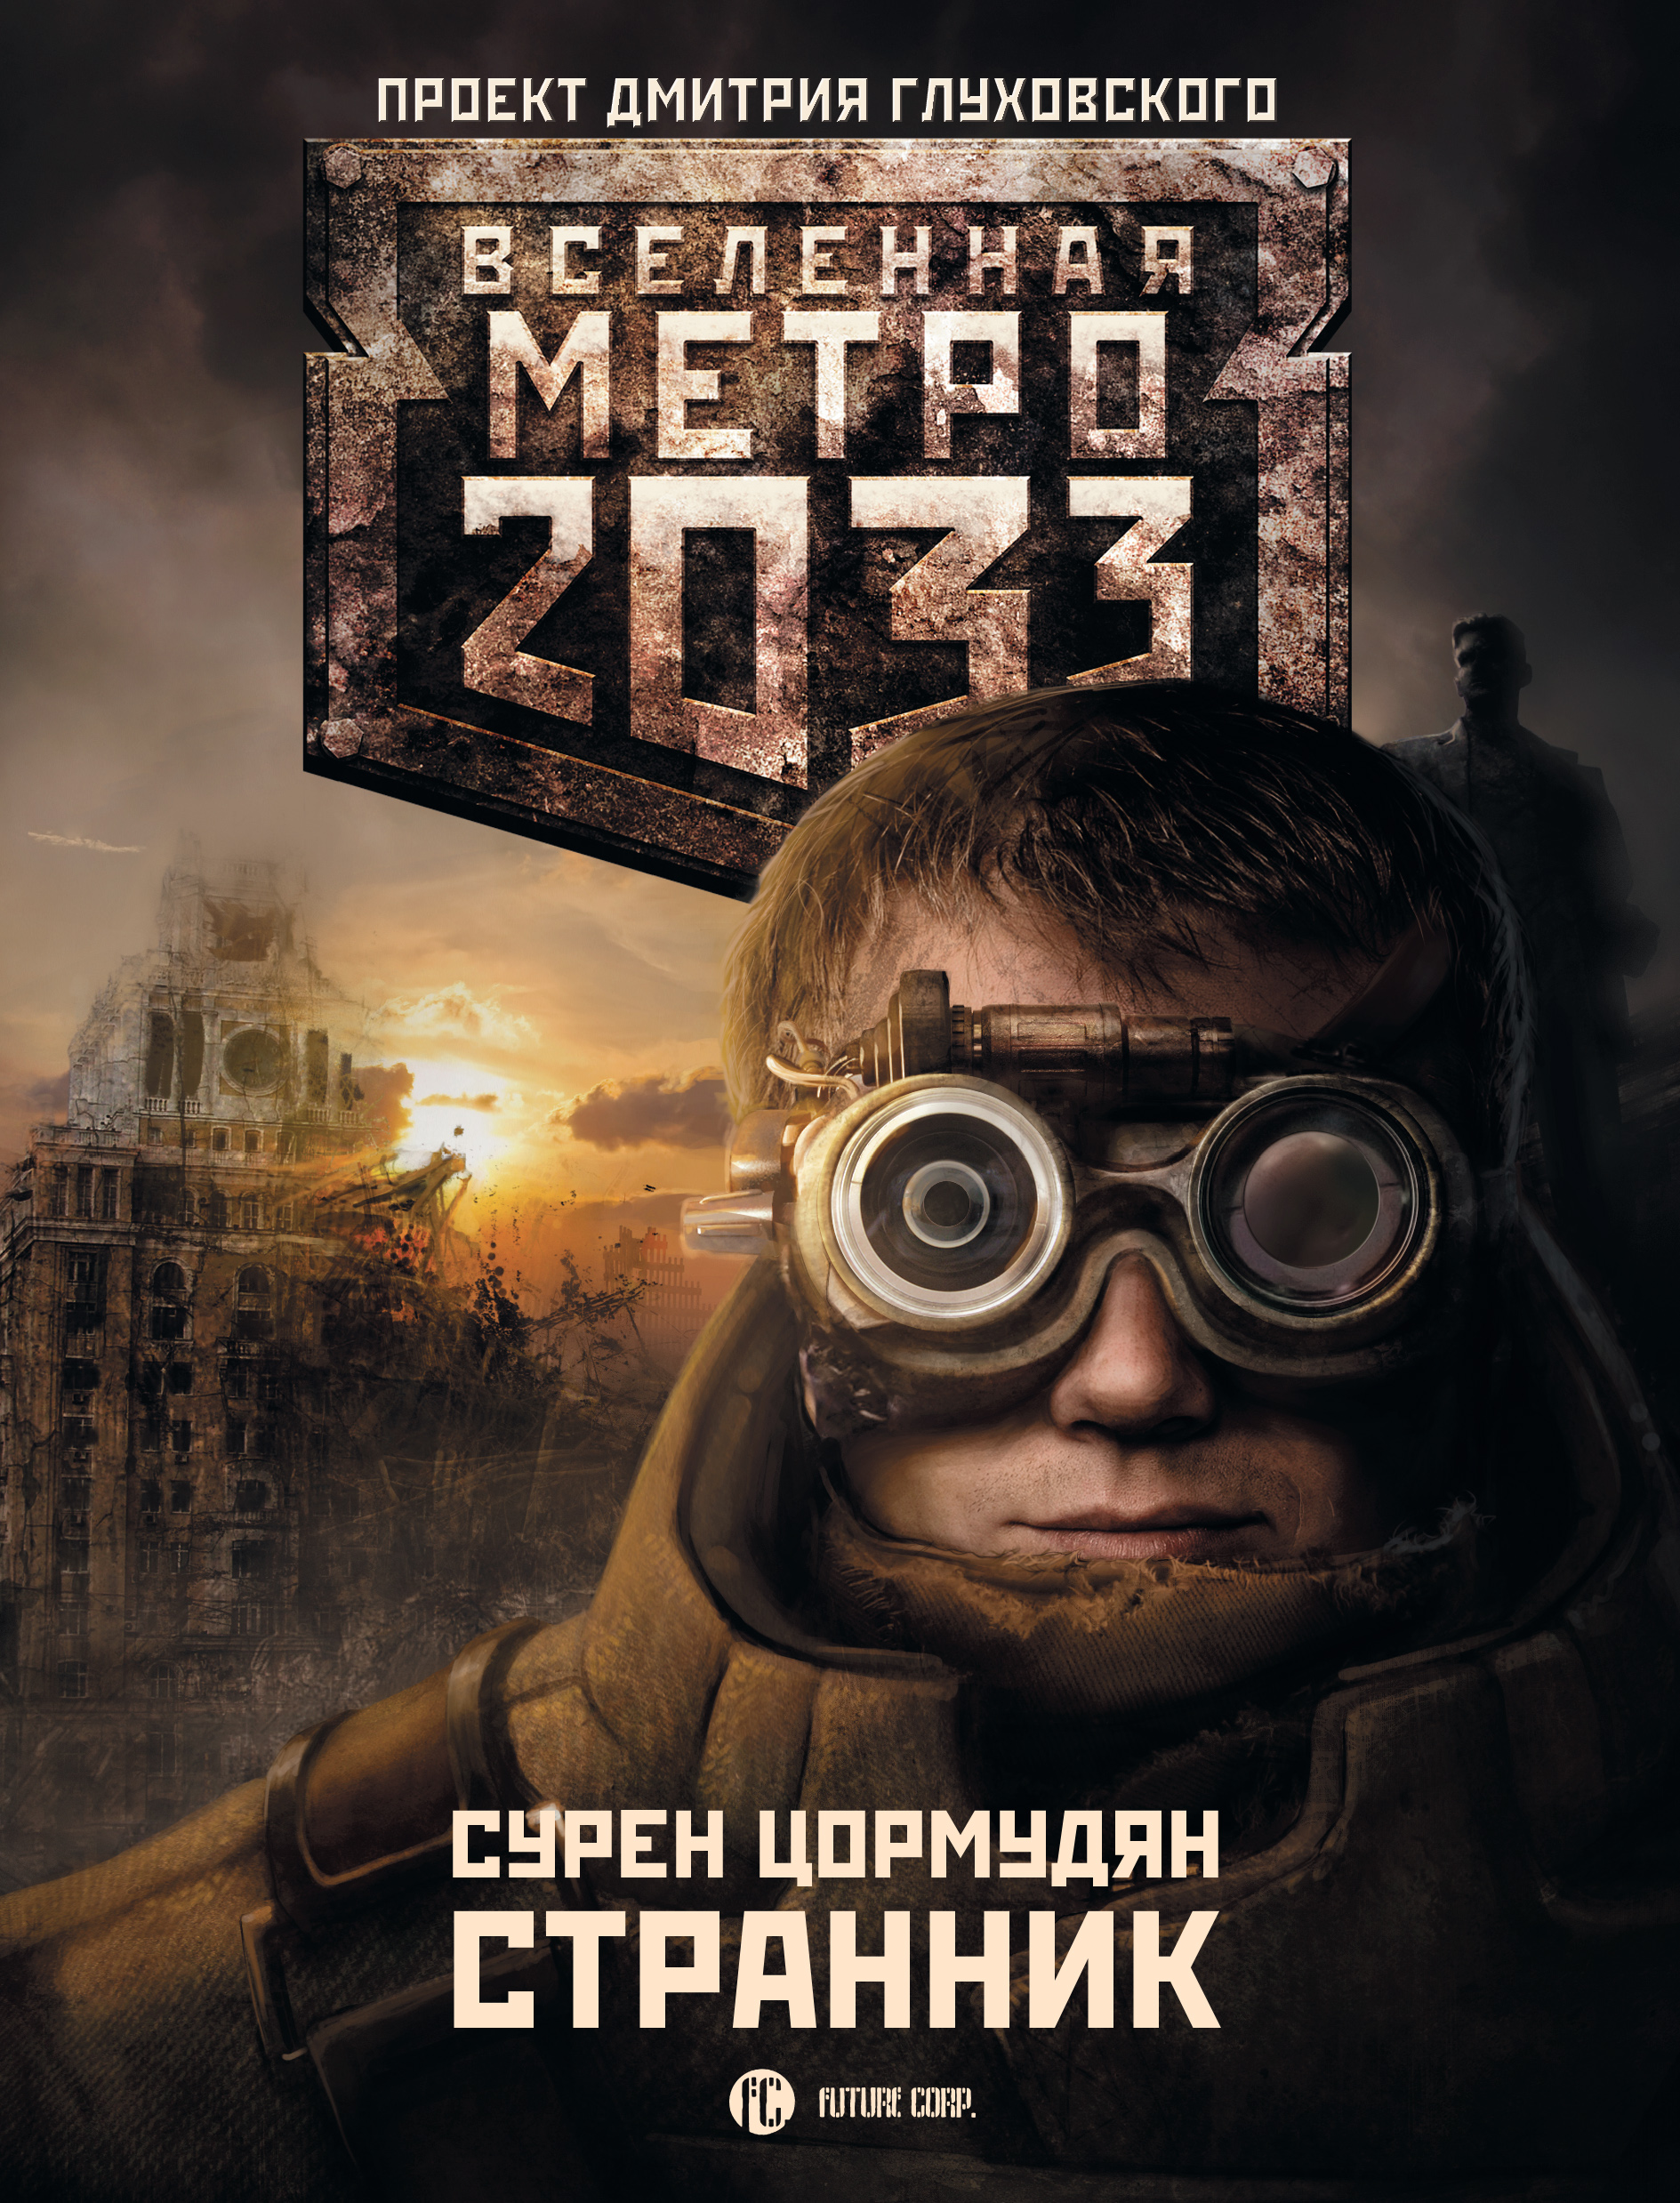 Сурен Цормудян Метро 2033: Странник уленгов ю метро 2033 грань человечности isbn 9785170979134